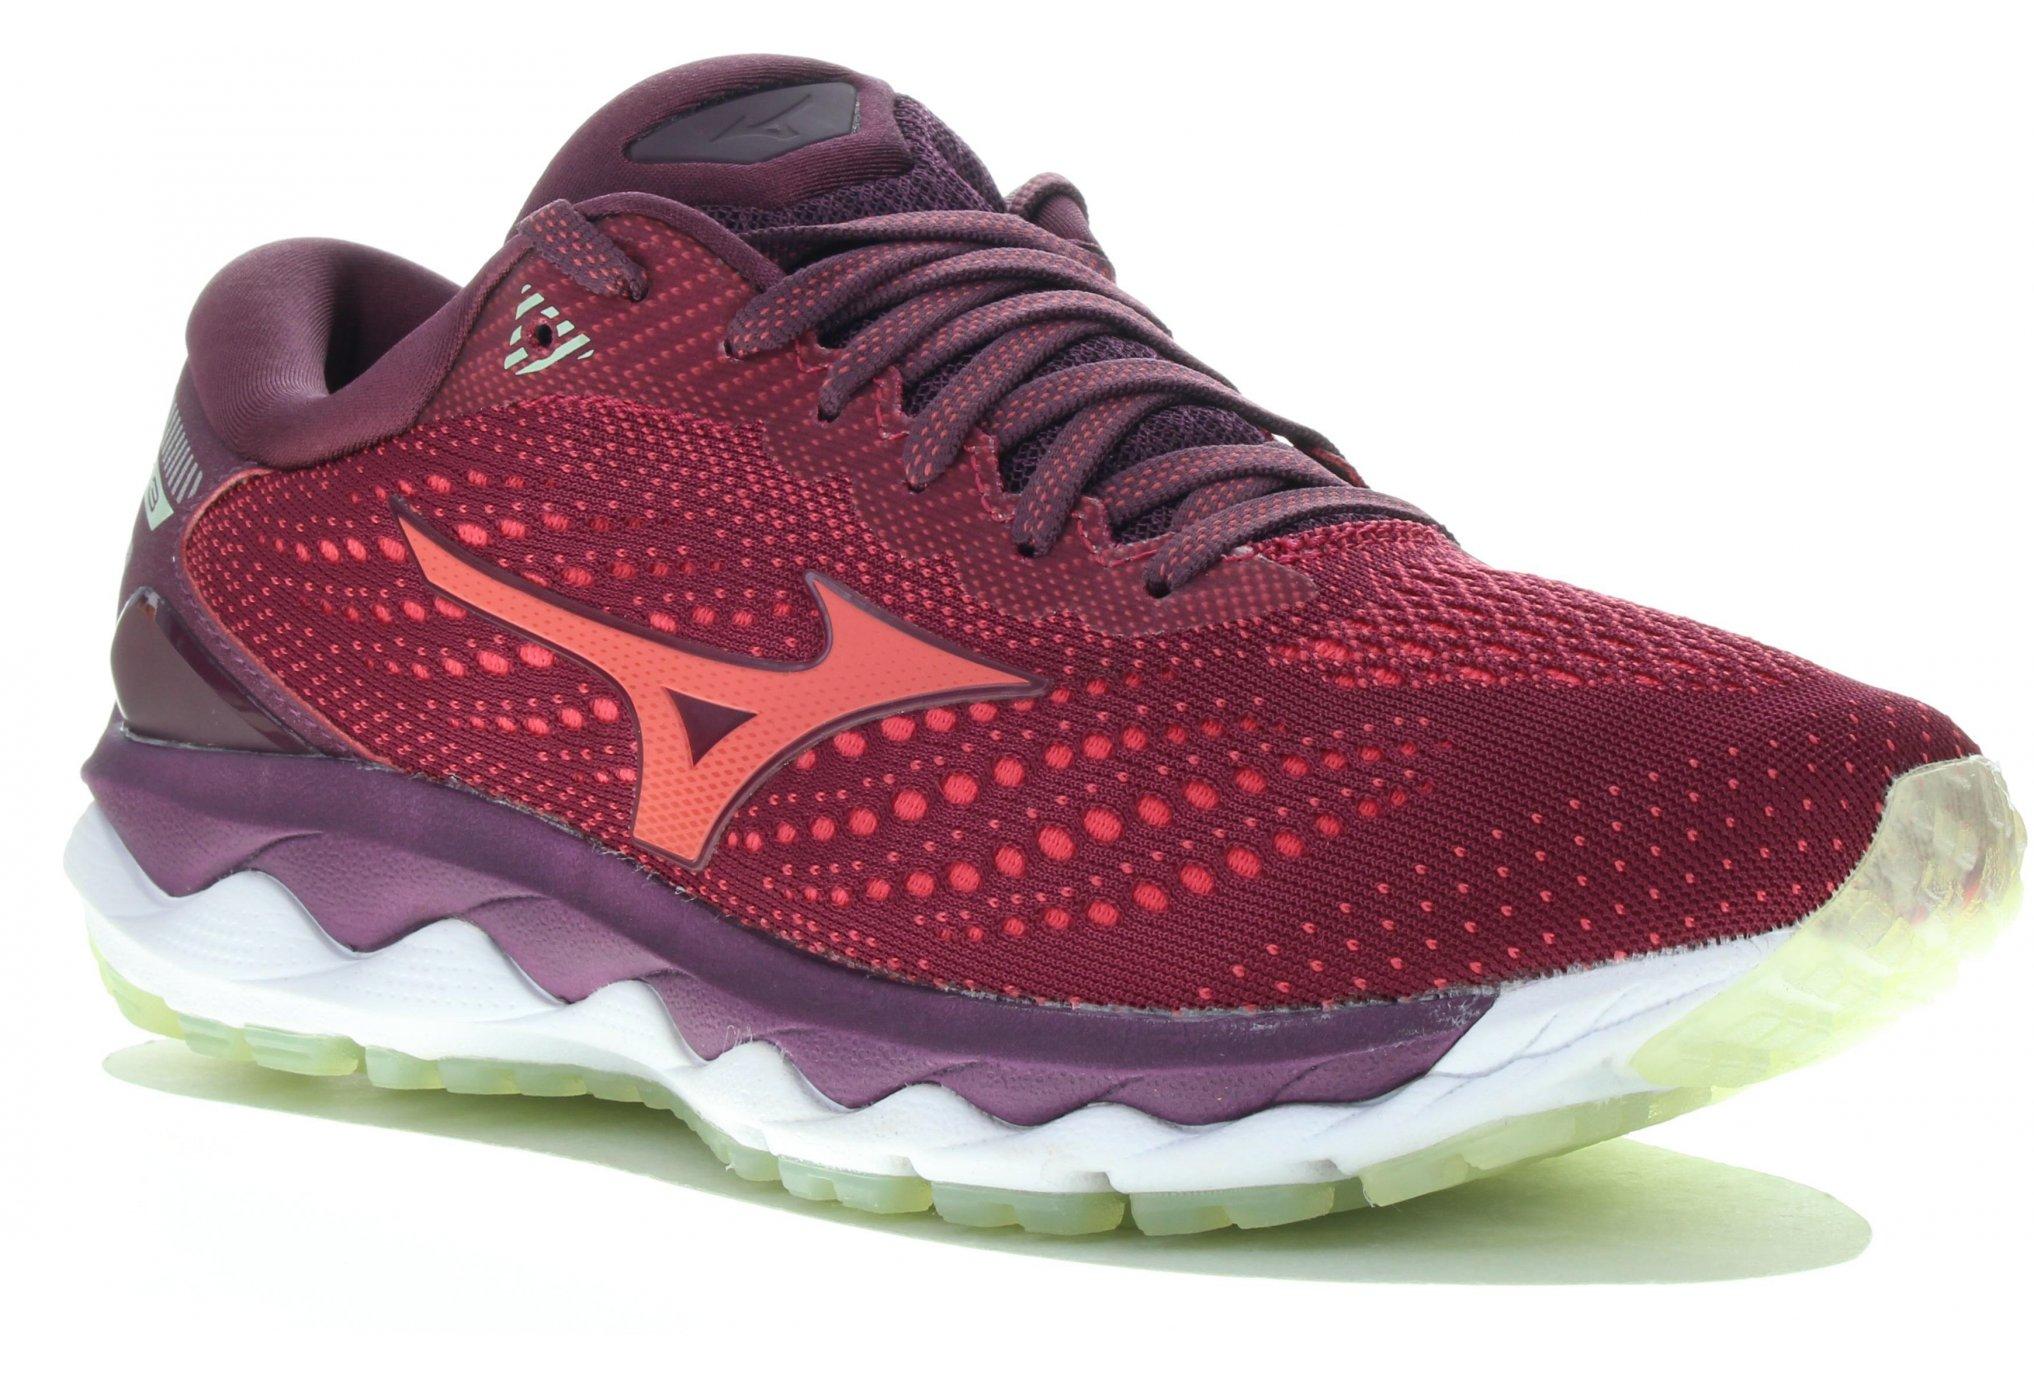 Mizuno Wave Sky 3 Chaussures running femme